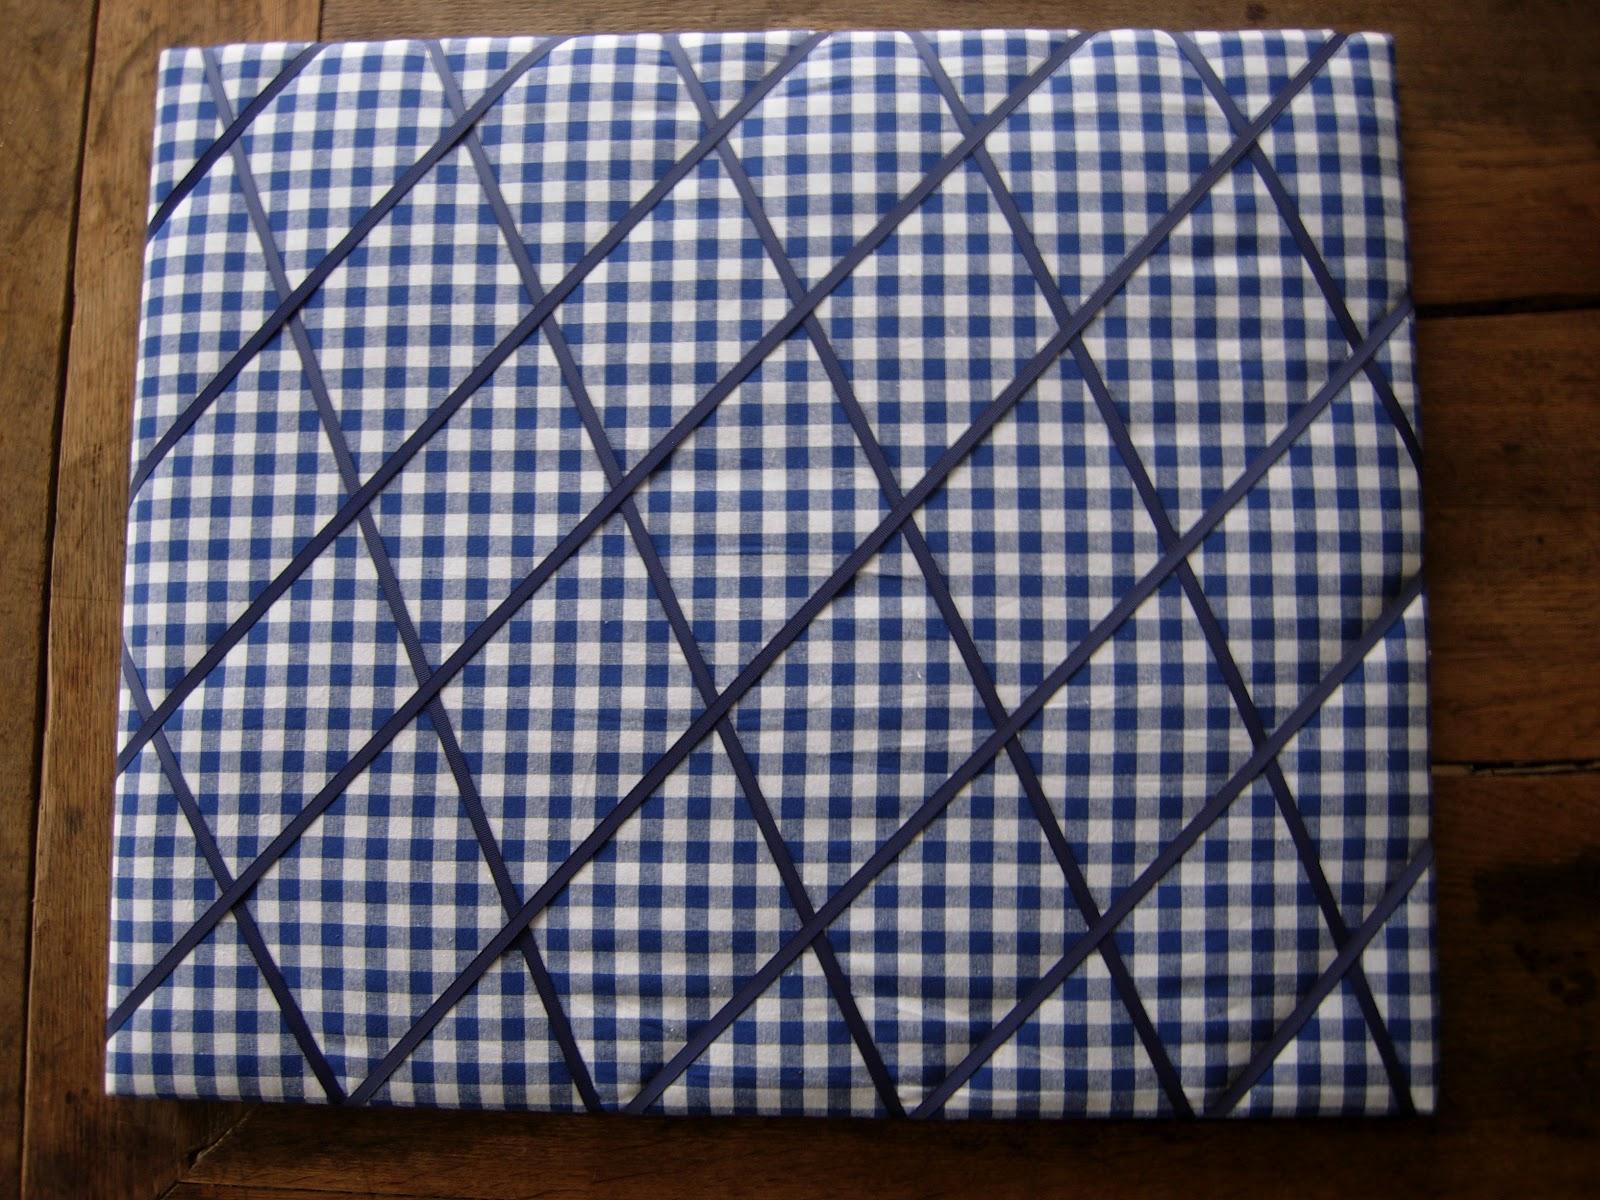 pinnwand gestalten trendy pinnand stoff bro notiz brett. Black Bedroom Furniture Sets. Home Design Ideas